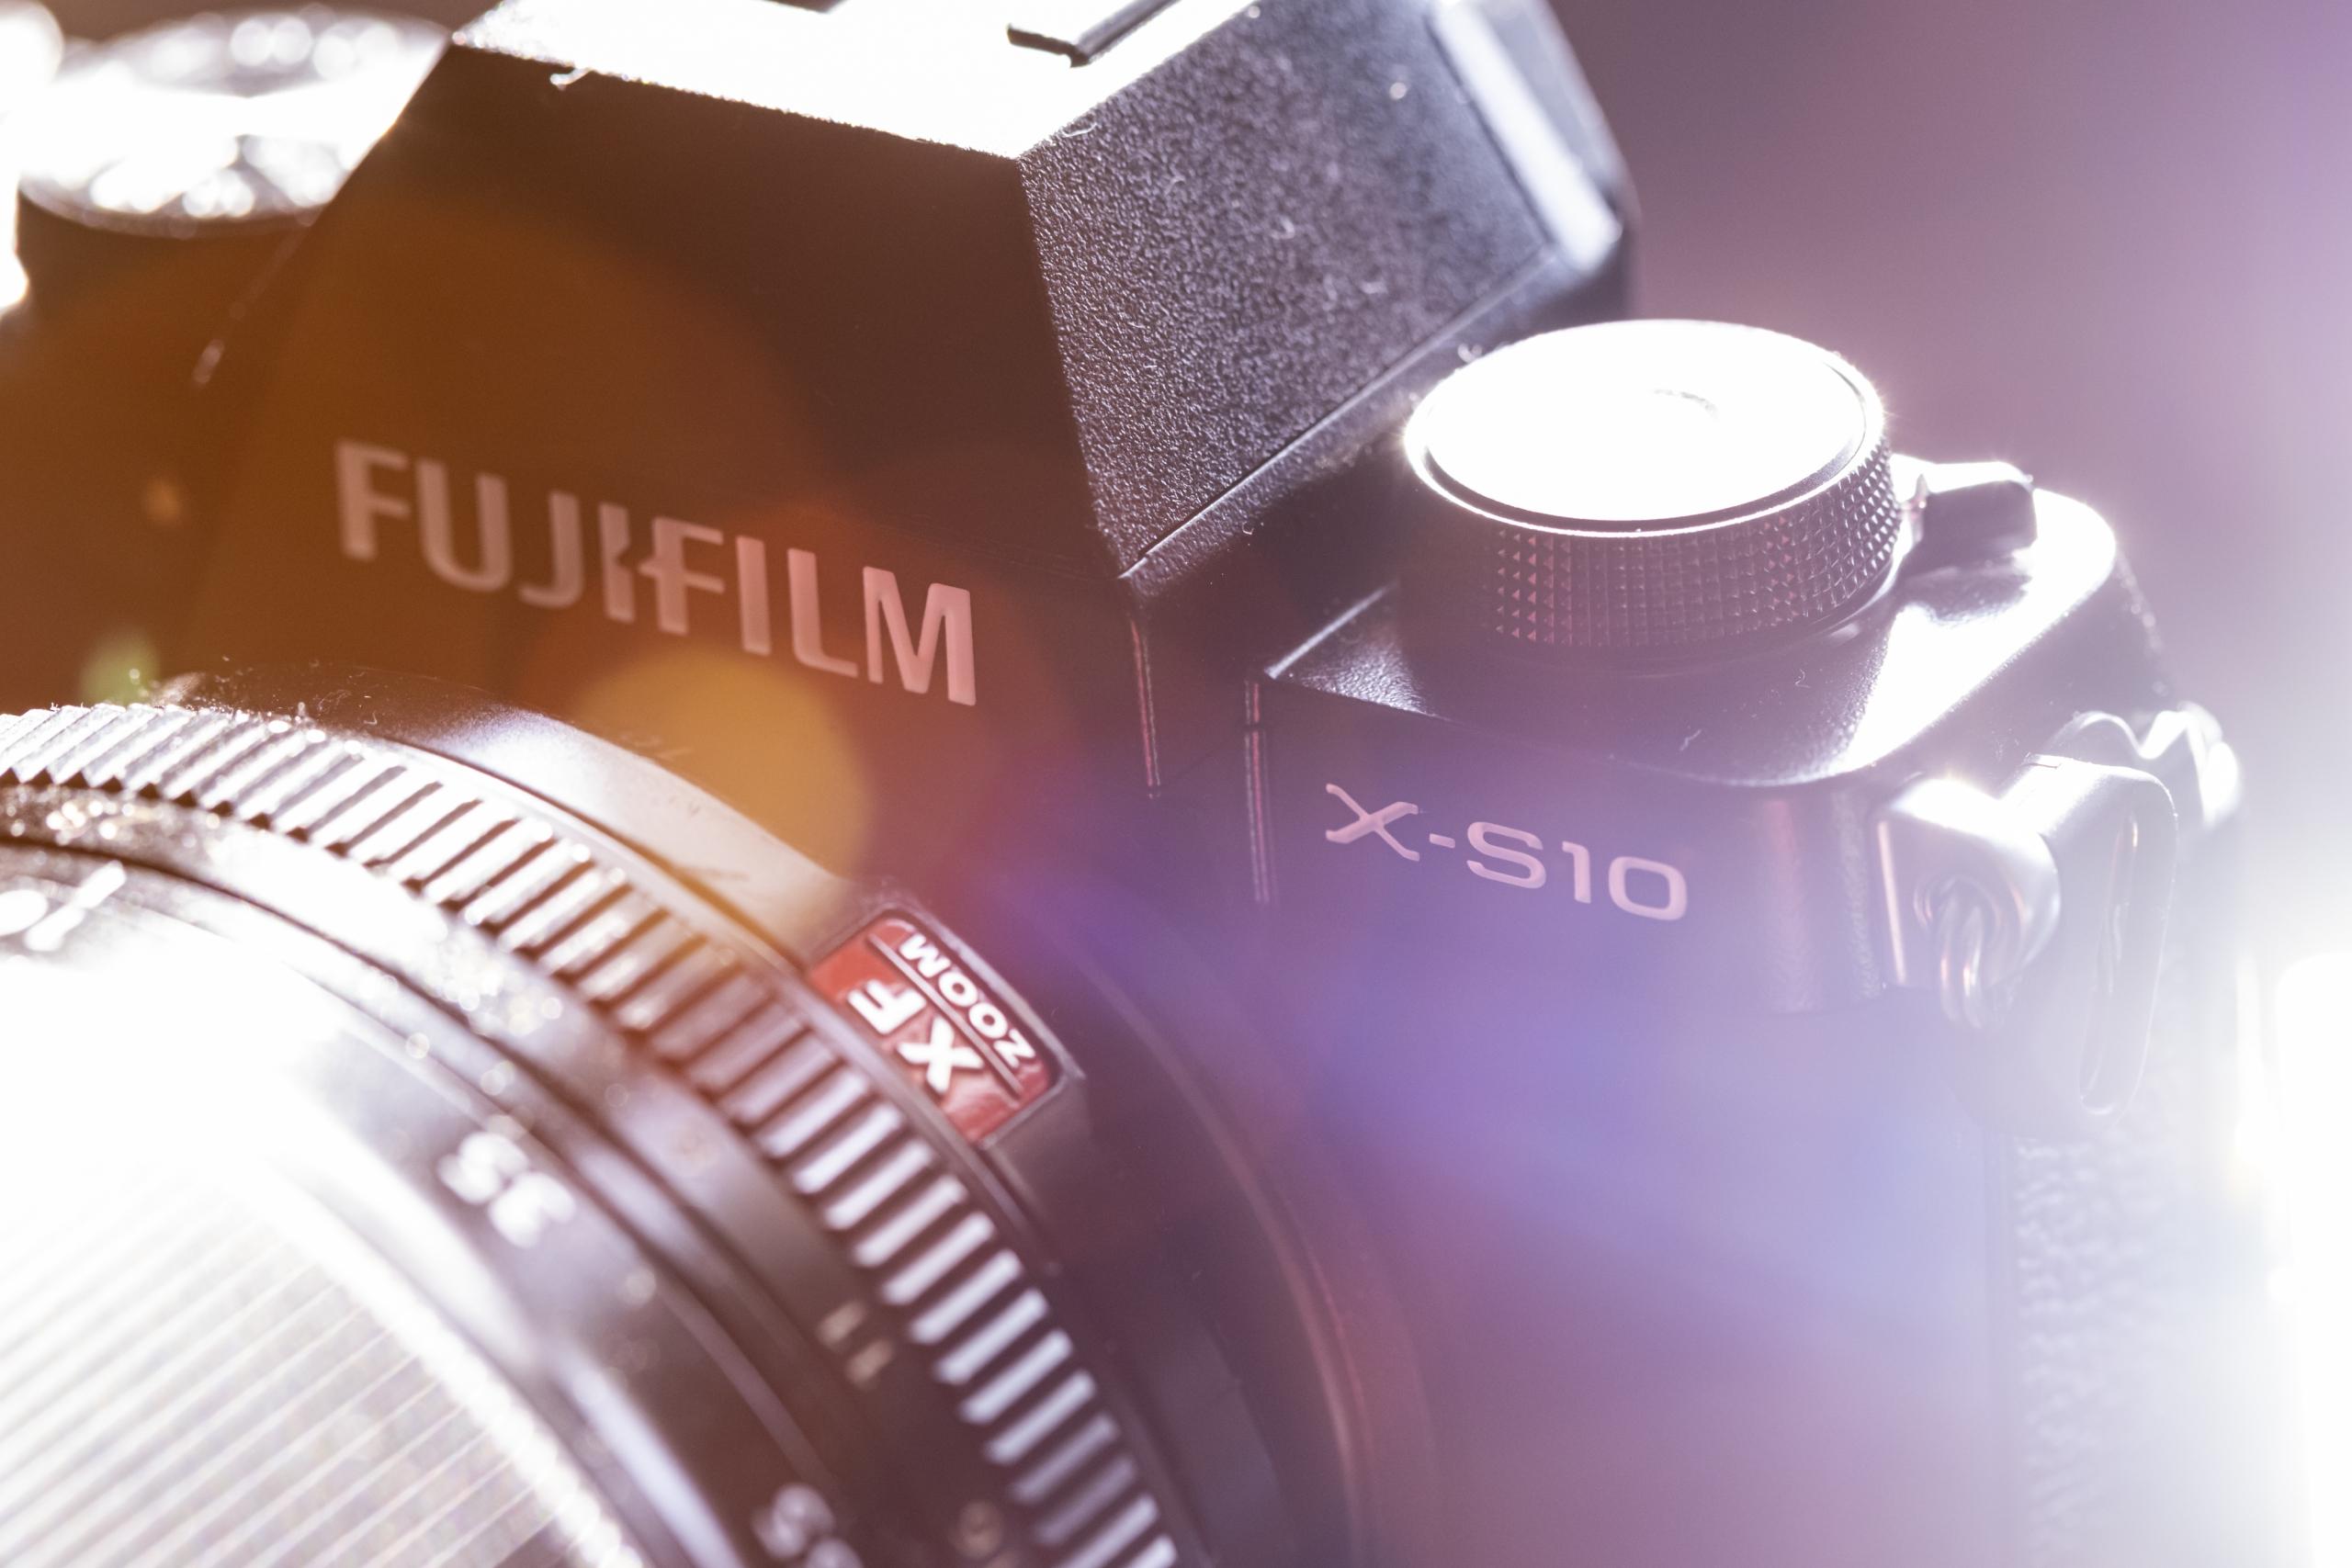 Fujifilm XS-10 Camera – Your Daily Travel Companion